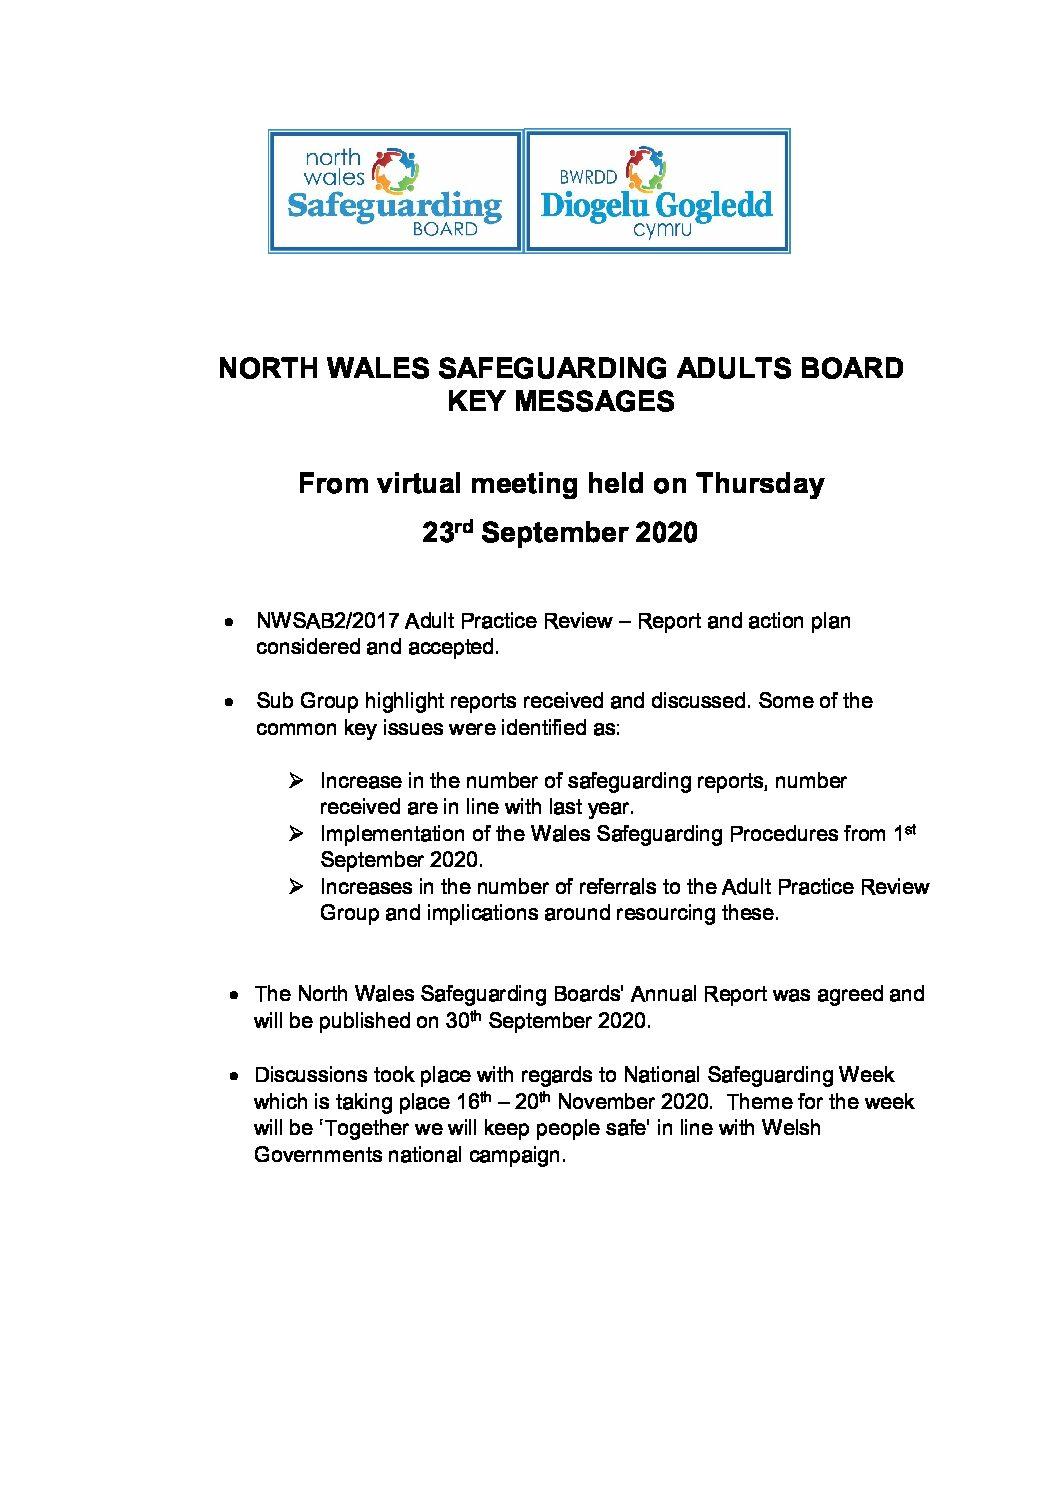 NWSAB Key Messages September 2020